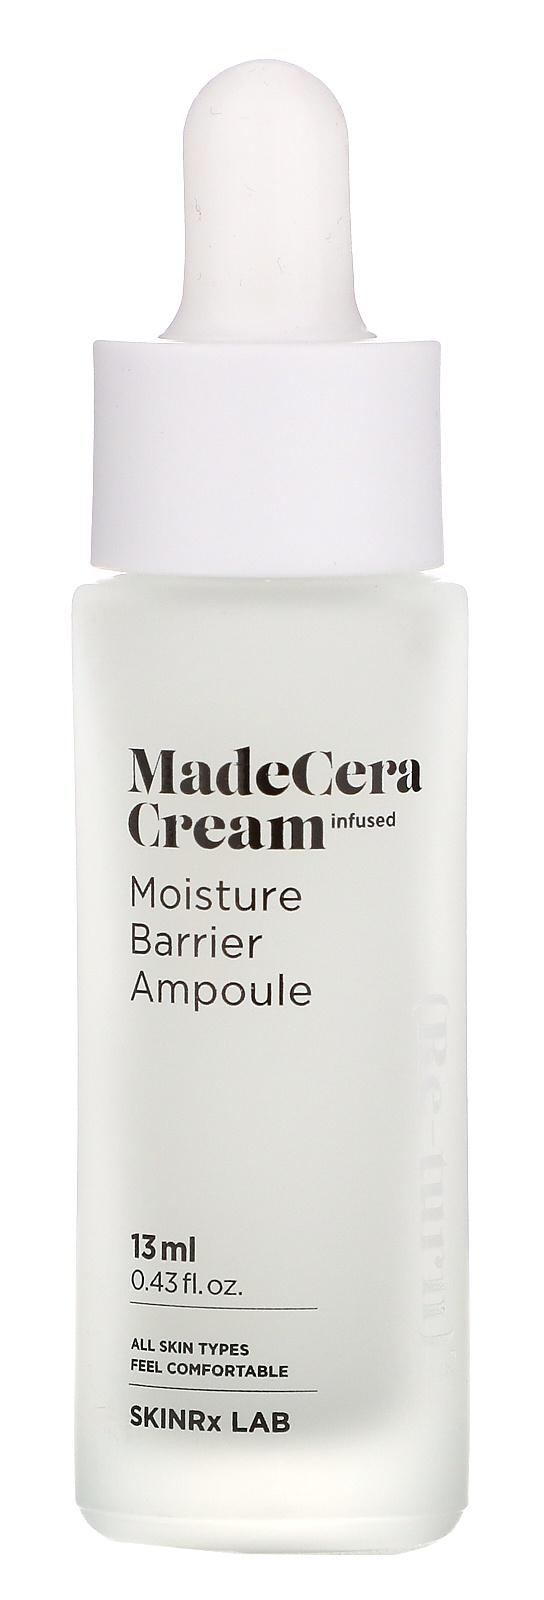 SKINRx LAB Madecera Cream Moisture Barrier Ampoule